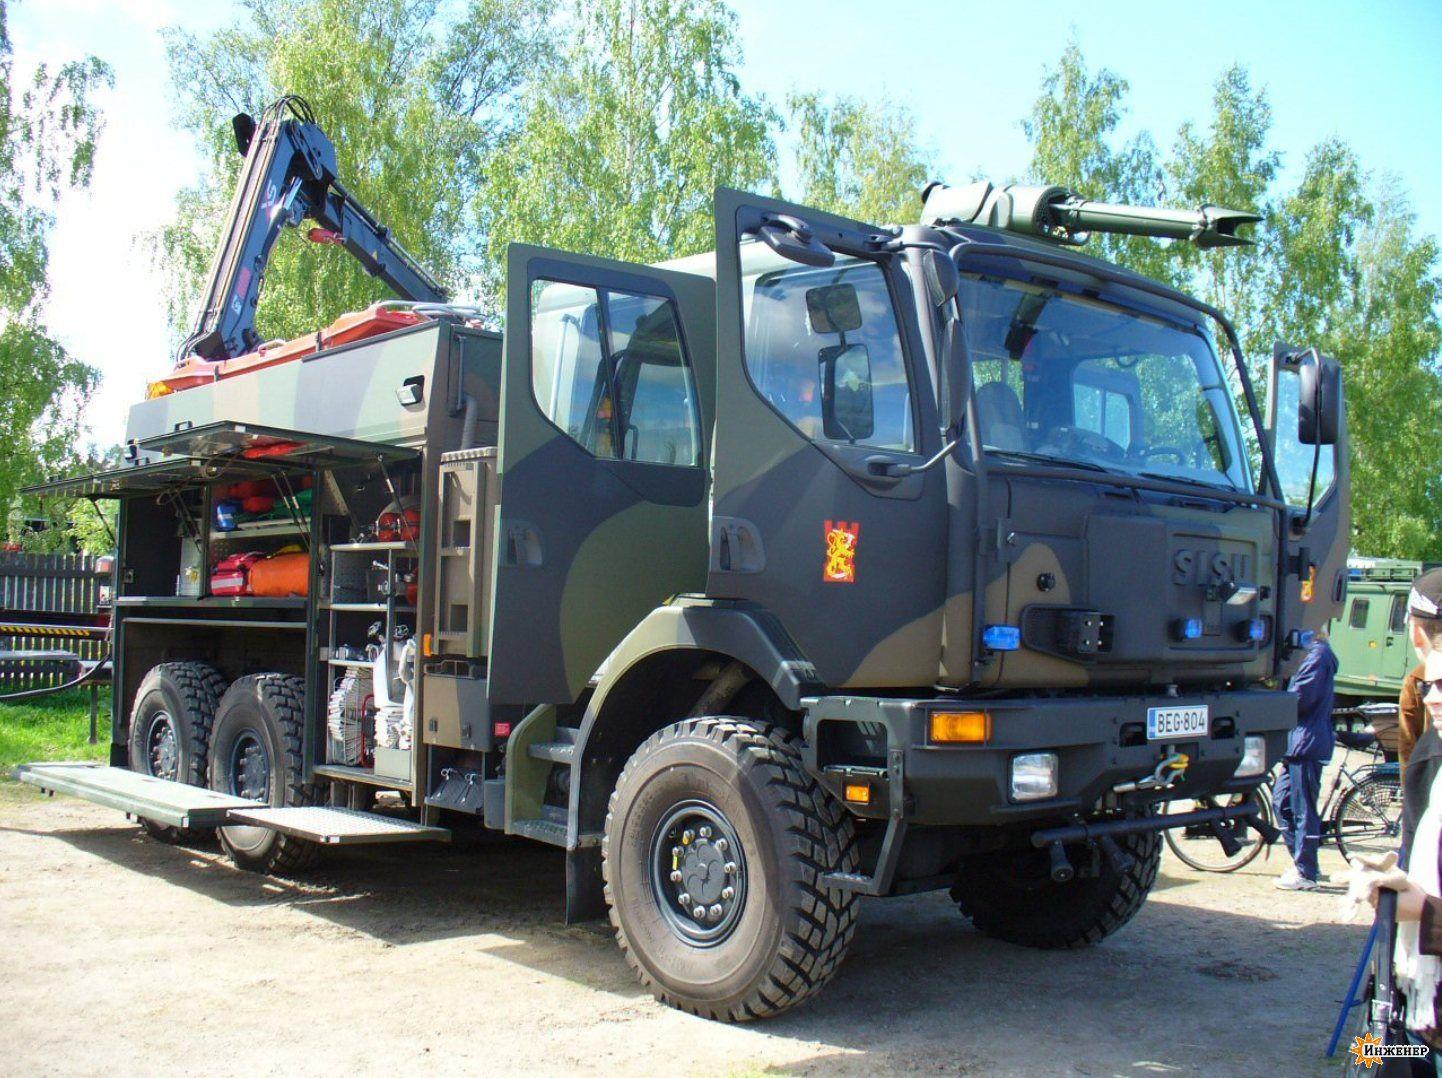 1653_1332842819_truckauto.info_sisuhmtvarff_4.jpg (310.86 Kb)